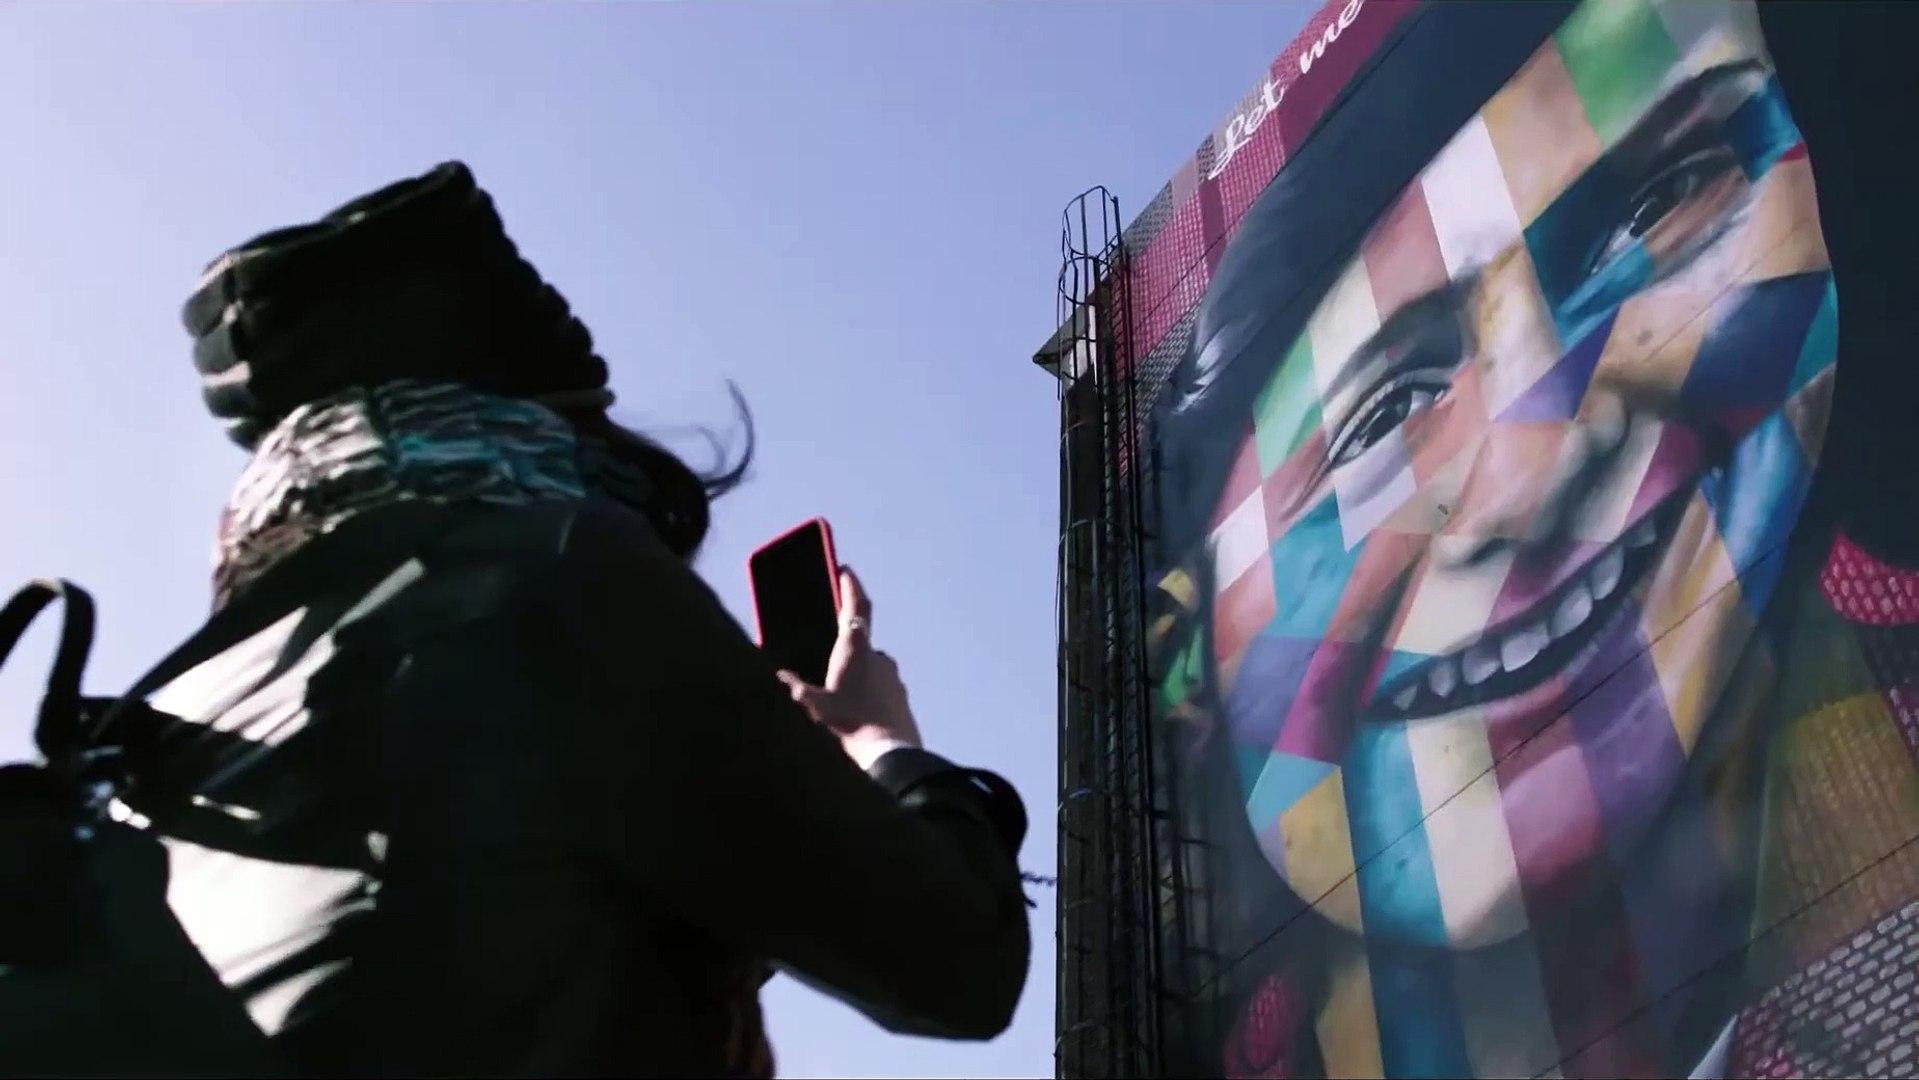 Descubriendo a Anna Frank. Historias paralelas - Vídeo Dailymotion